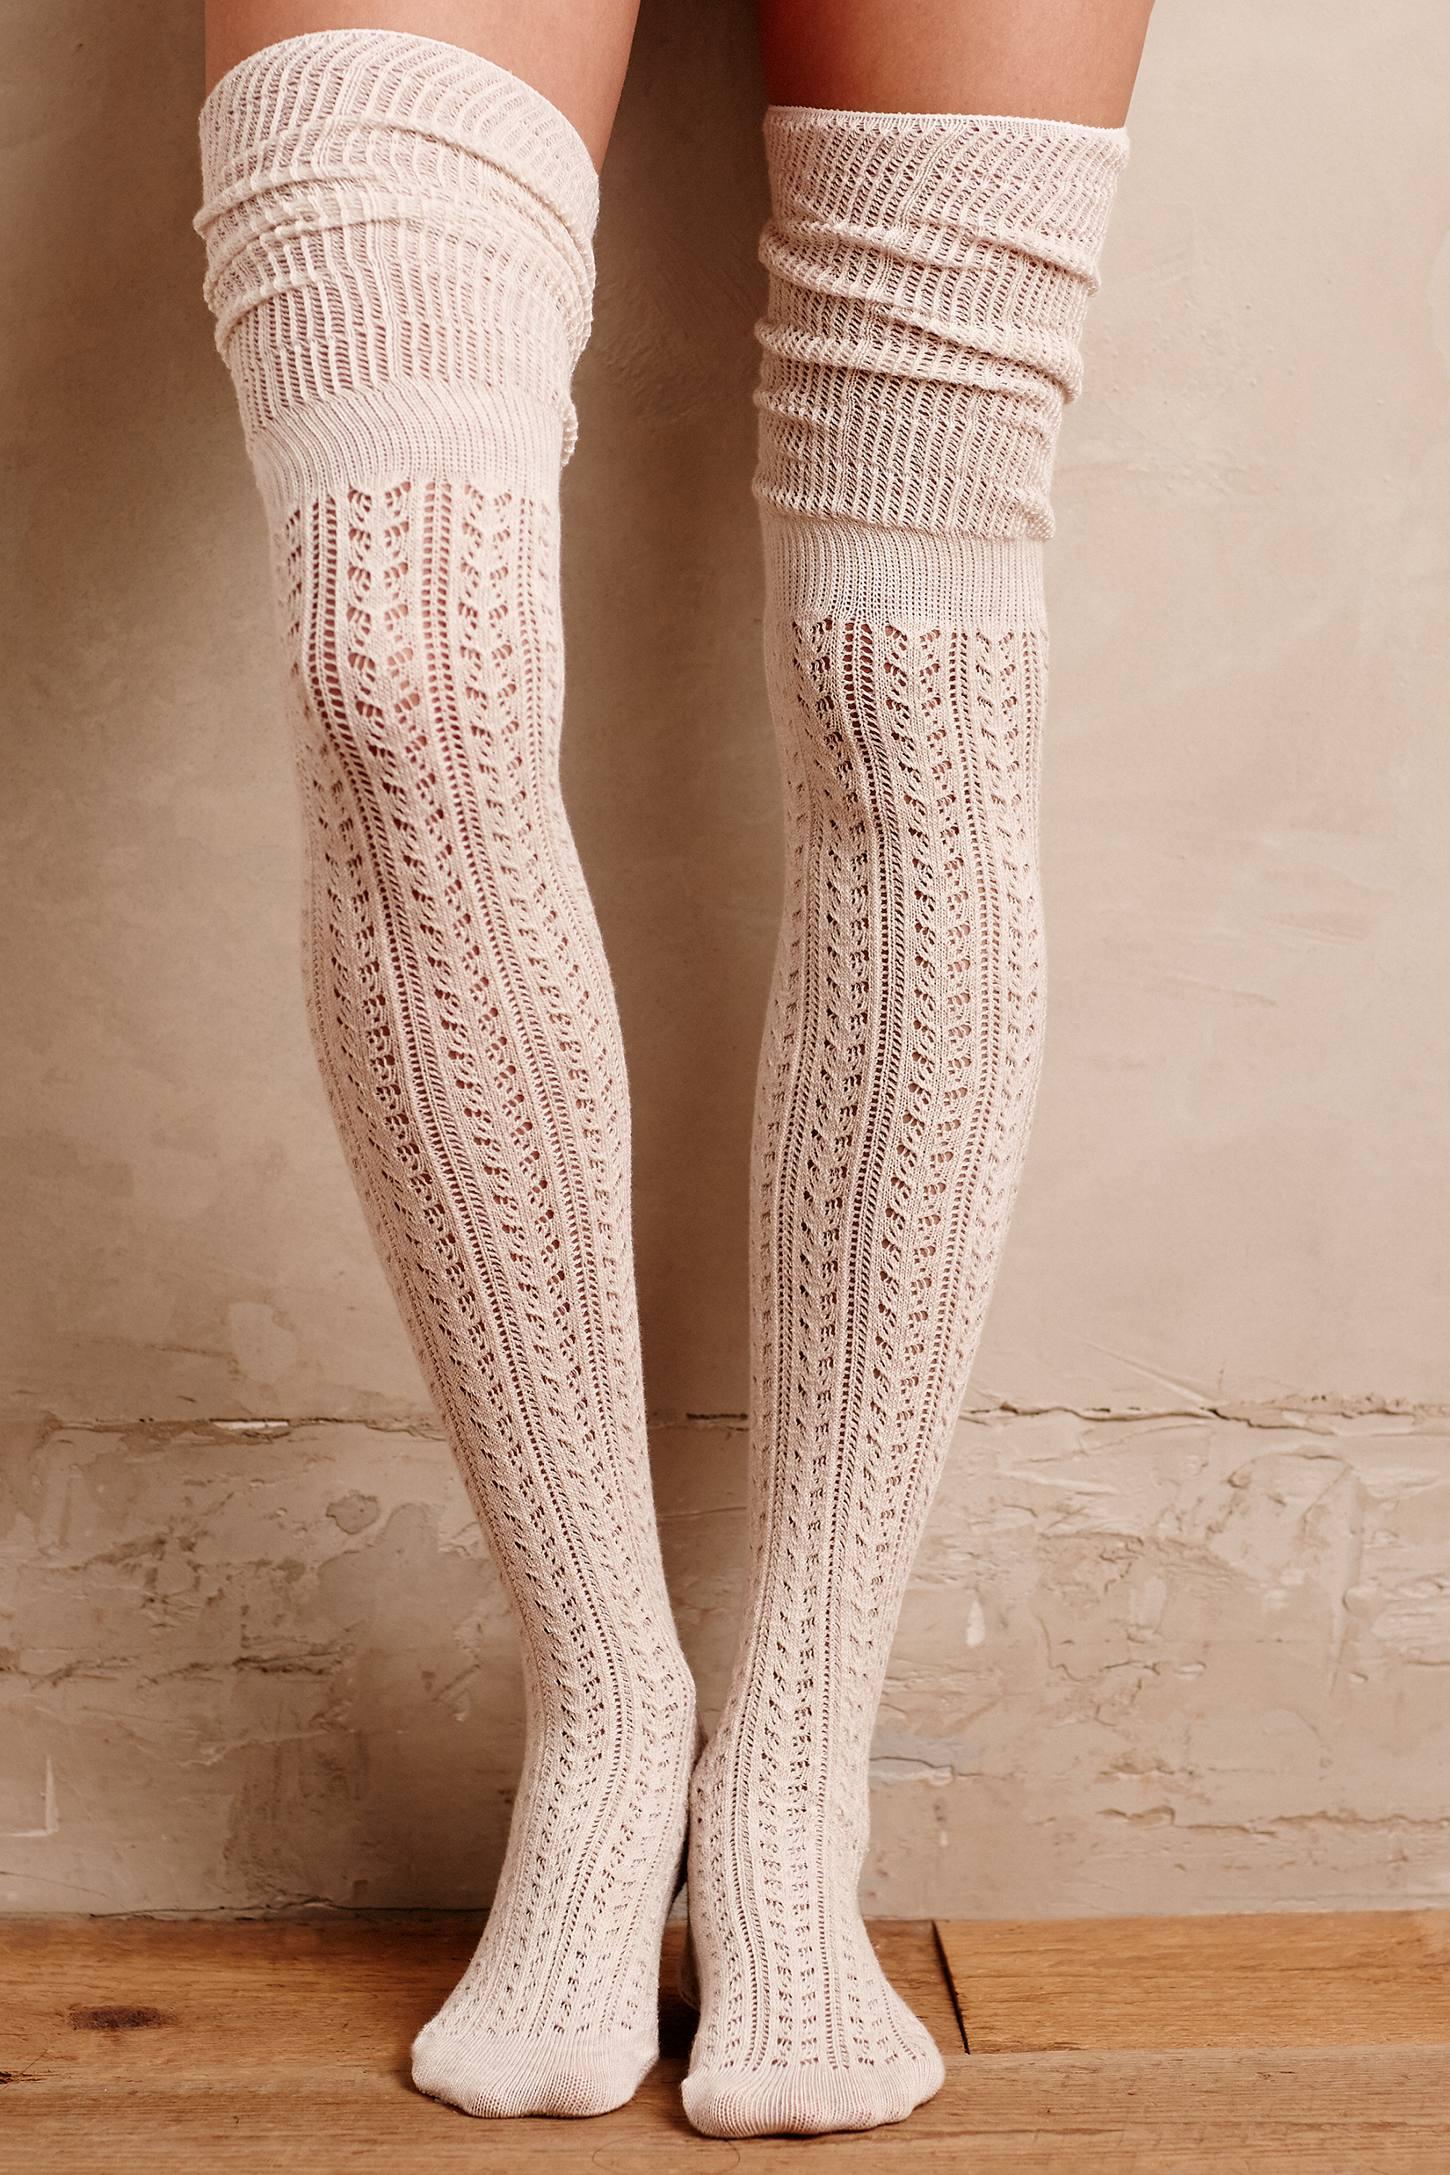 2 paia Donna Parigine Calze Caldo Cotone sopra il ginocchio Calze Oltre Ginocchio Blu